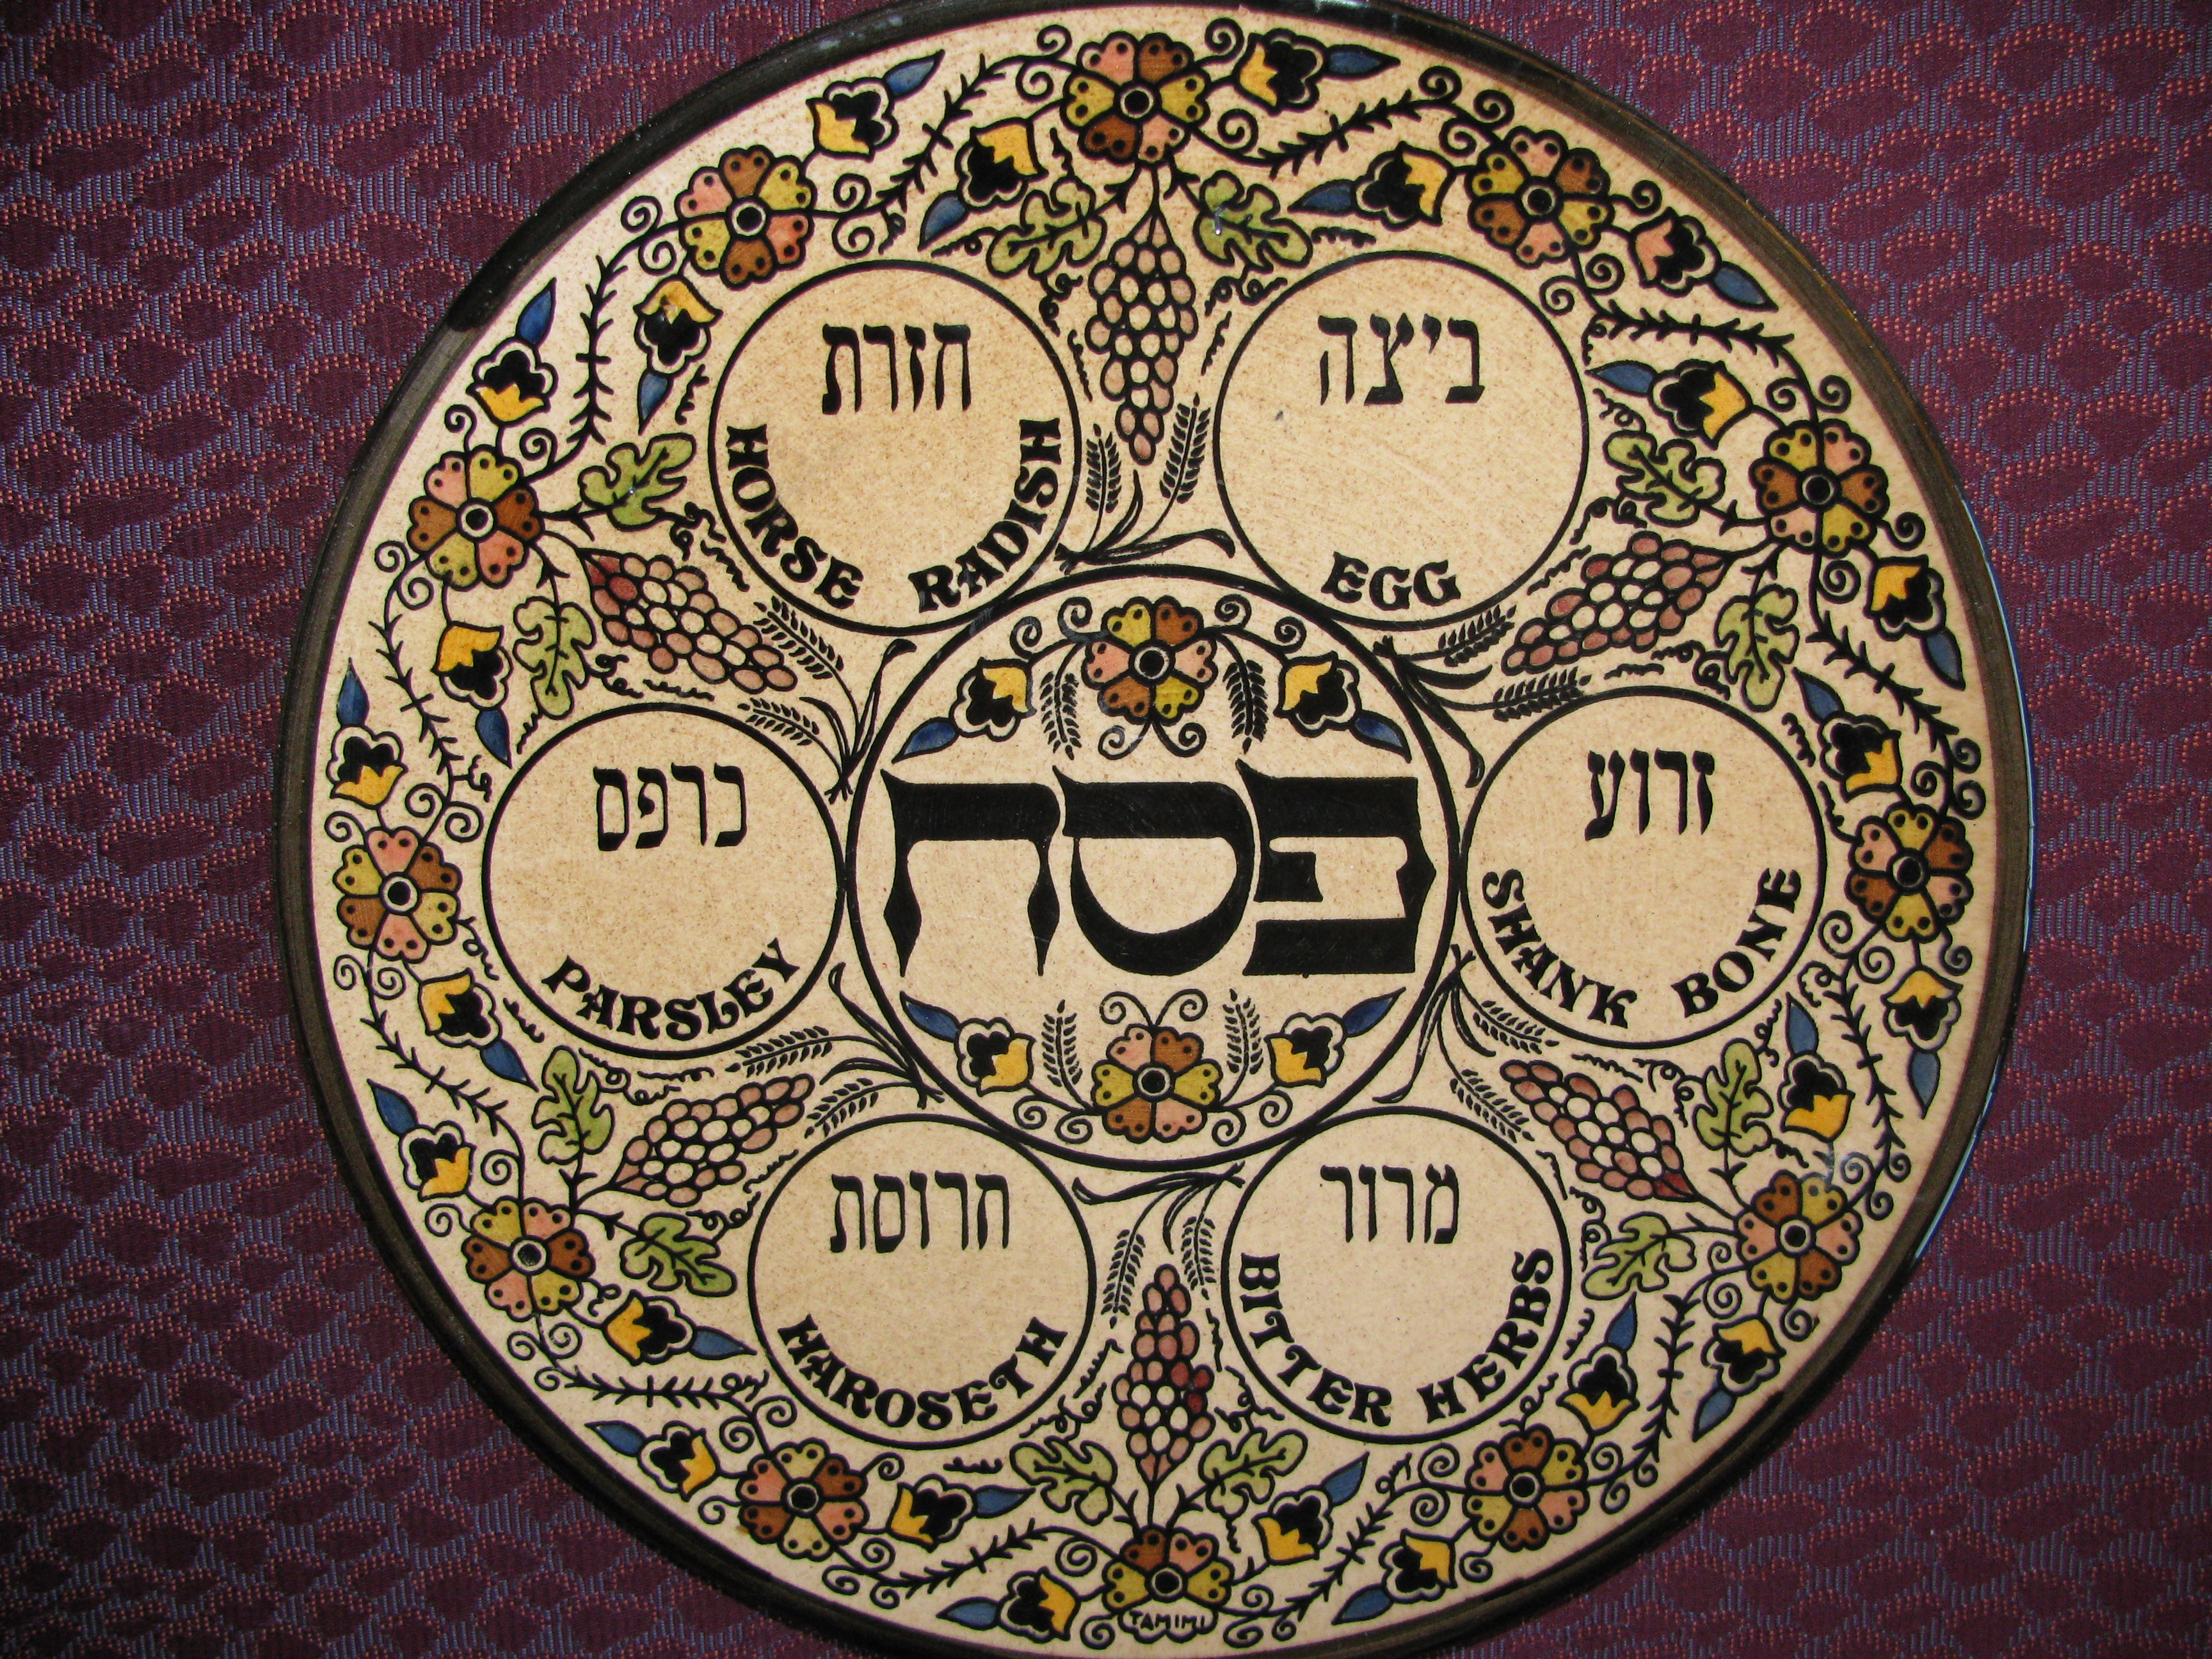 Some Passover Tidbits